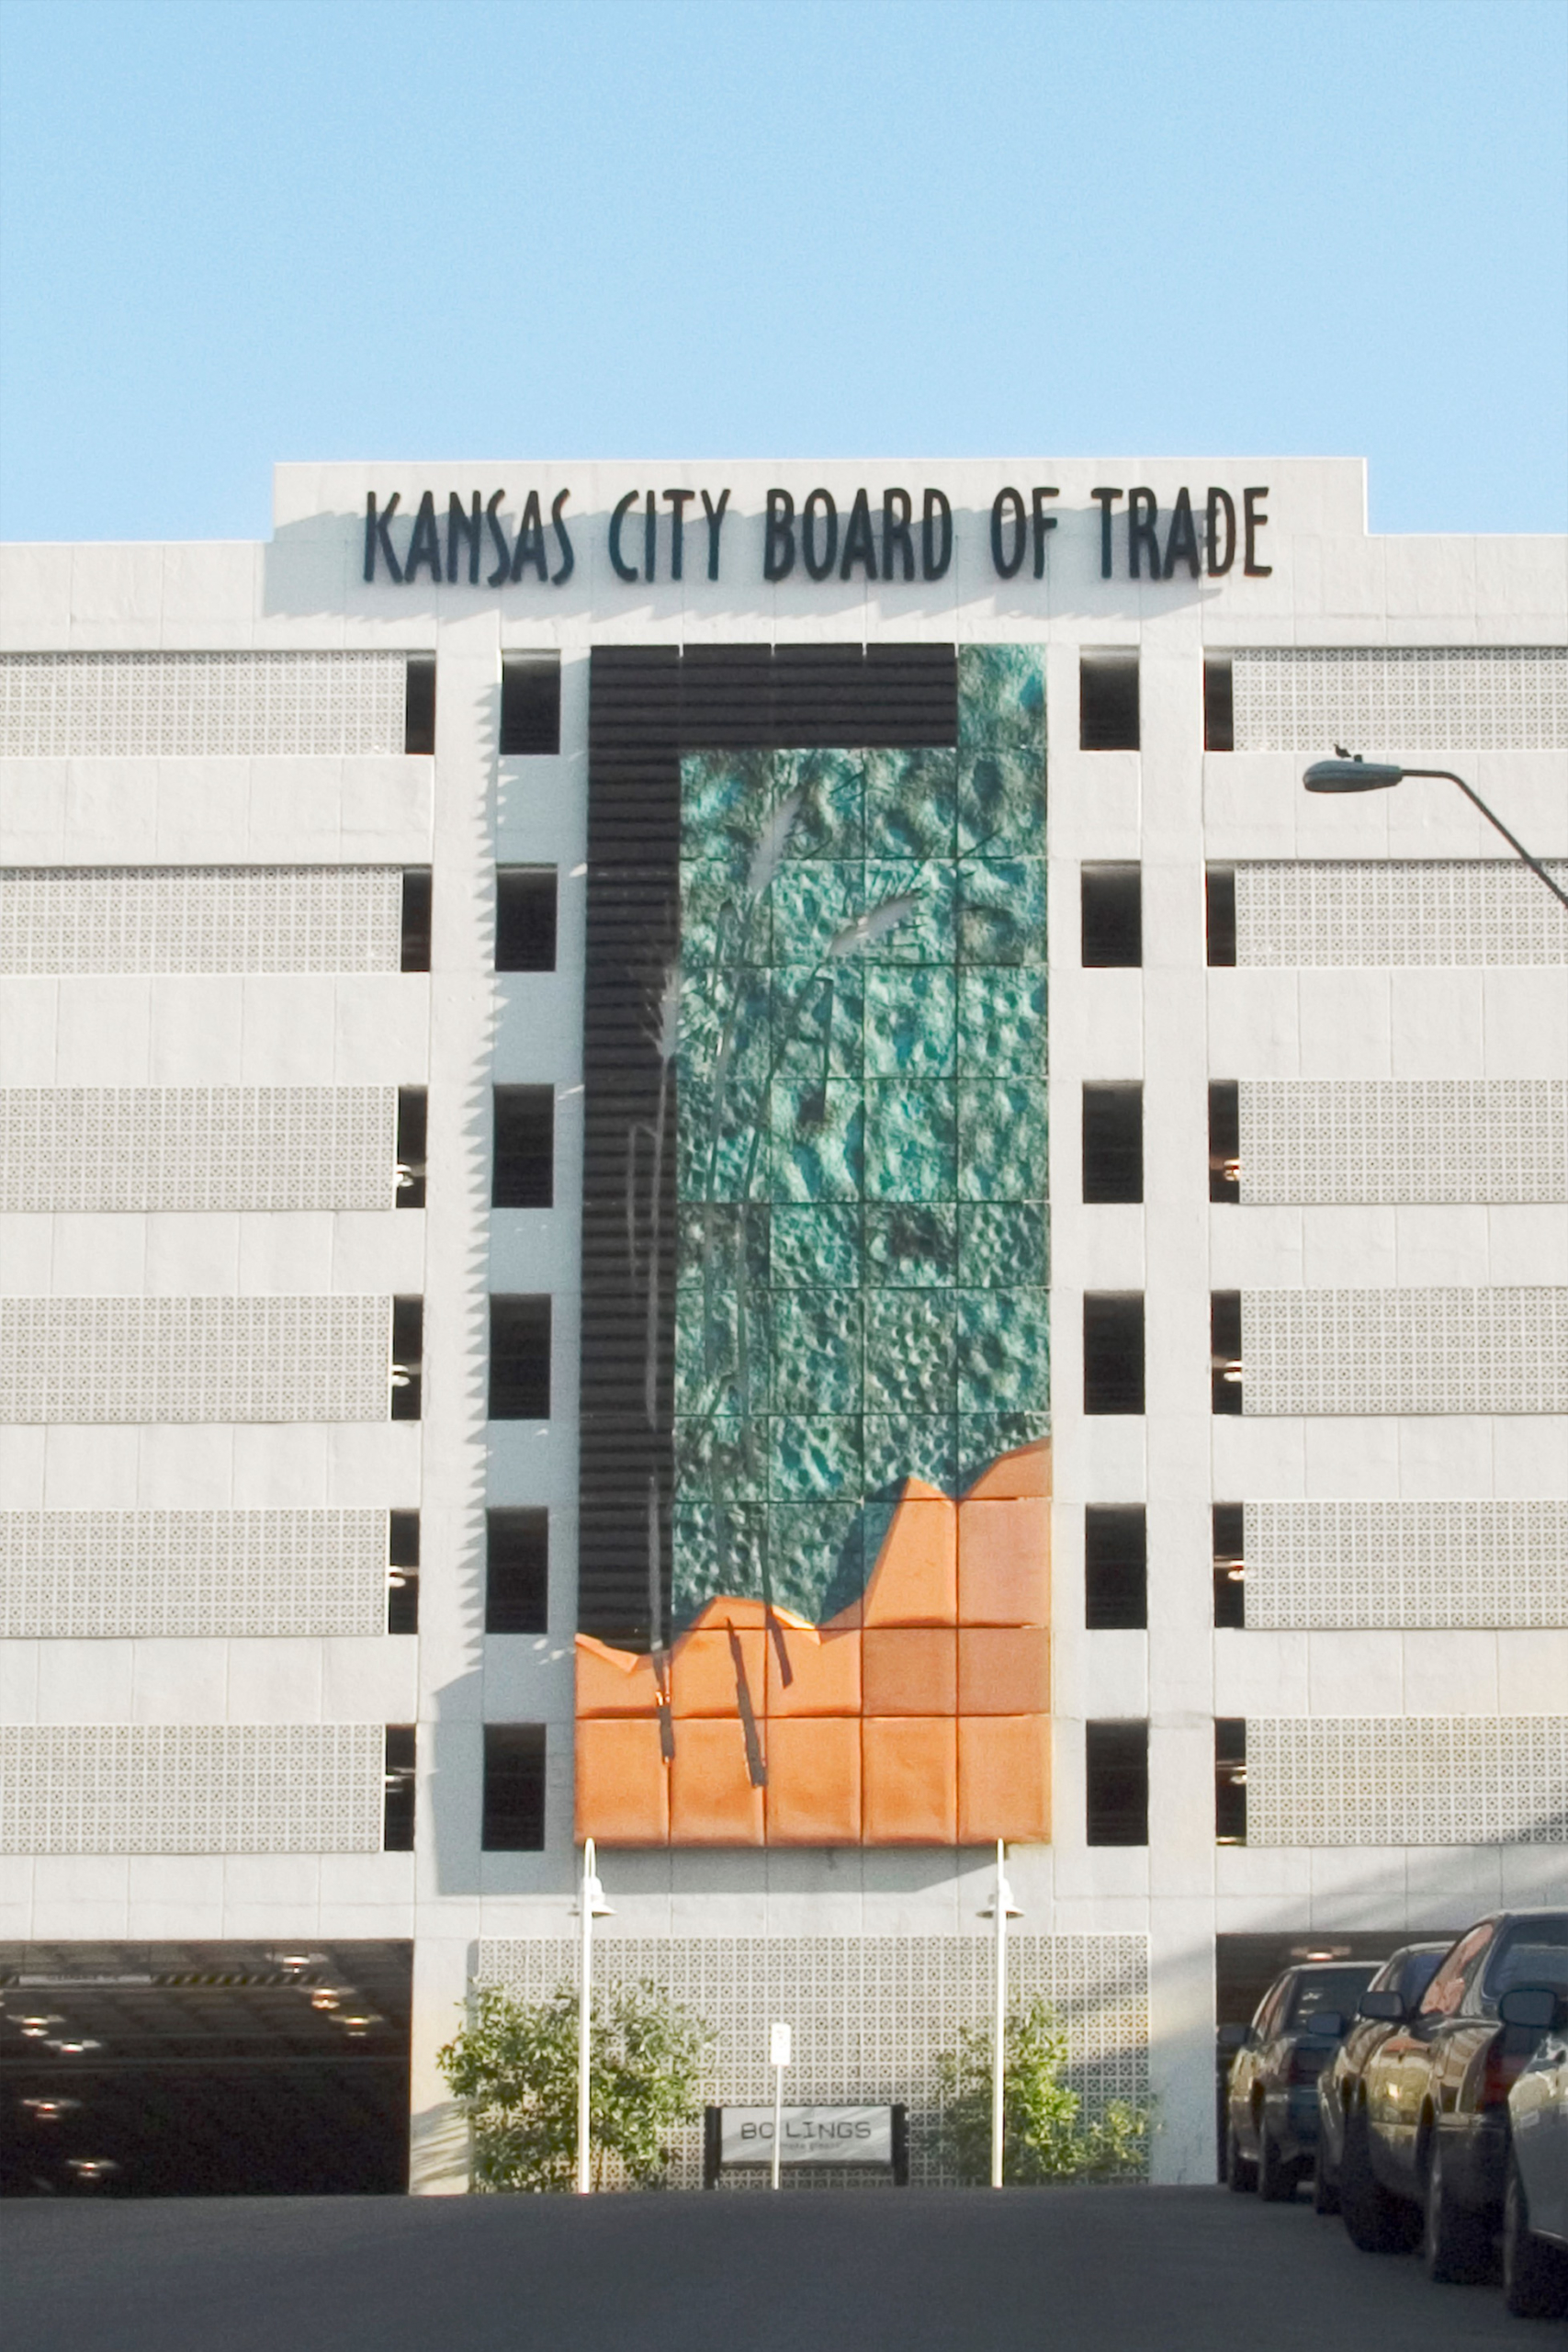 Heartland Harvest at the Kansas City Board of Trade.